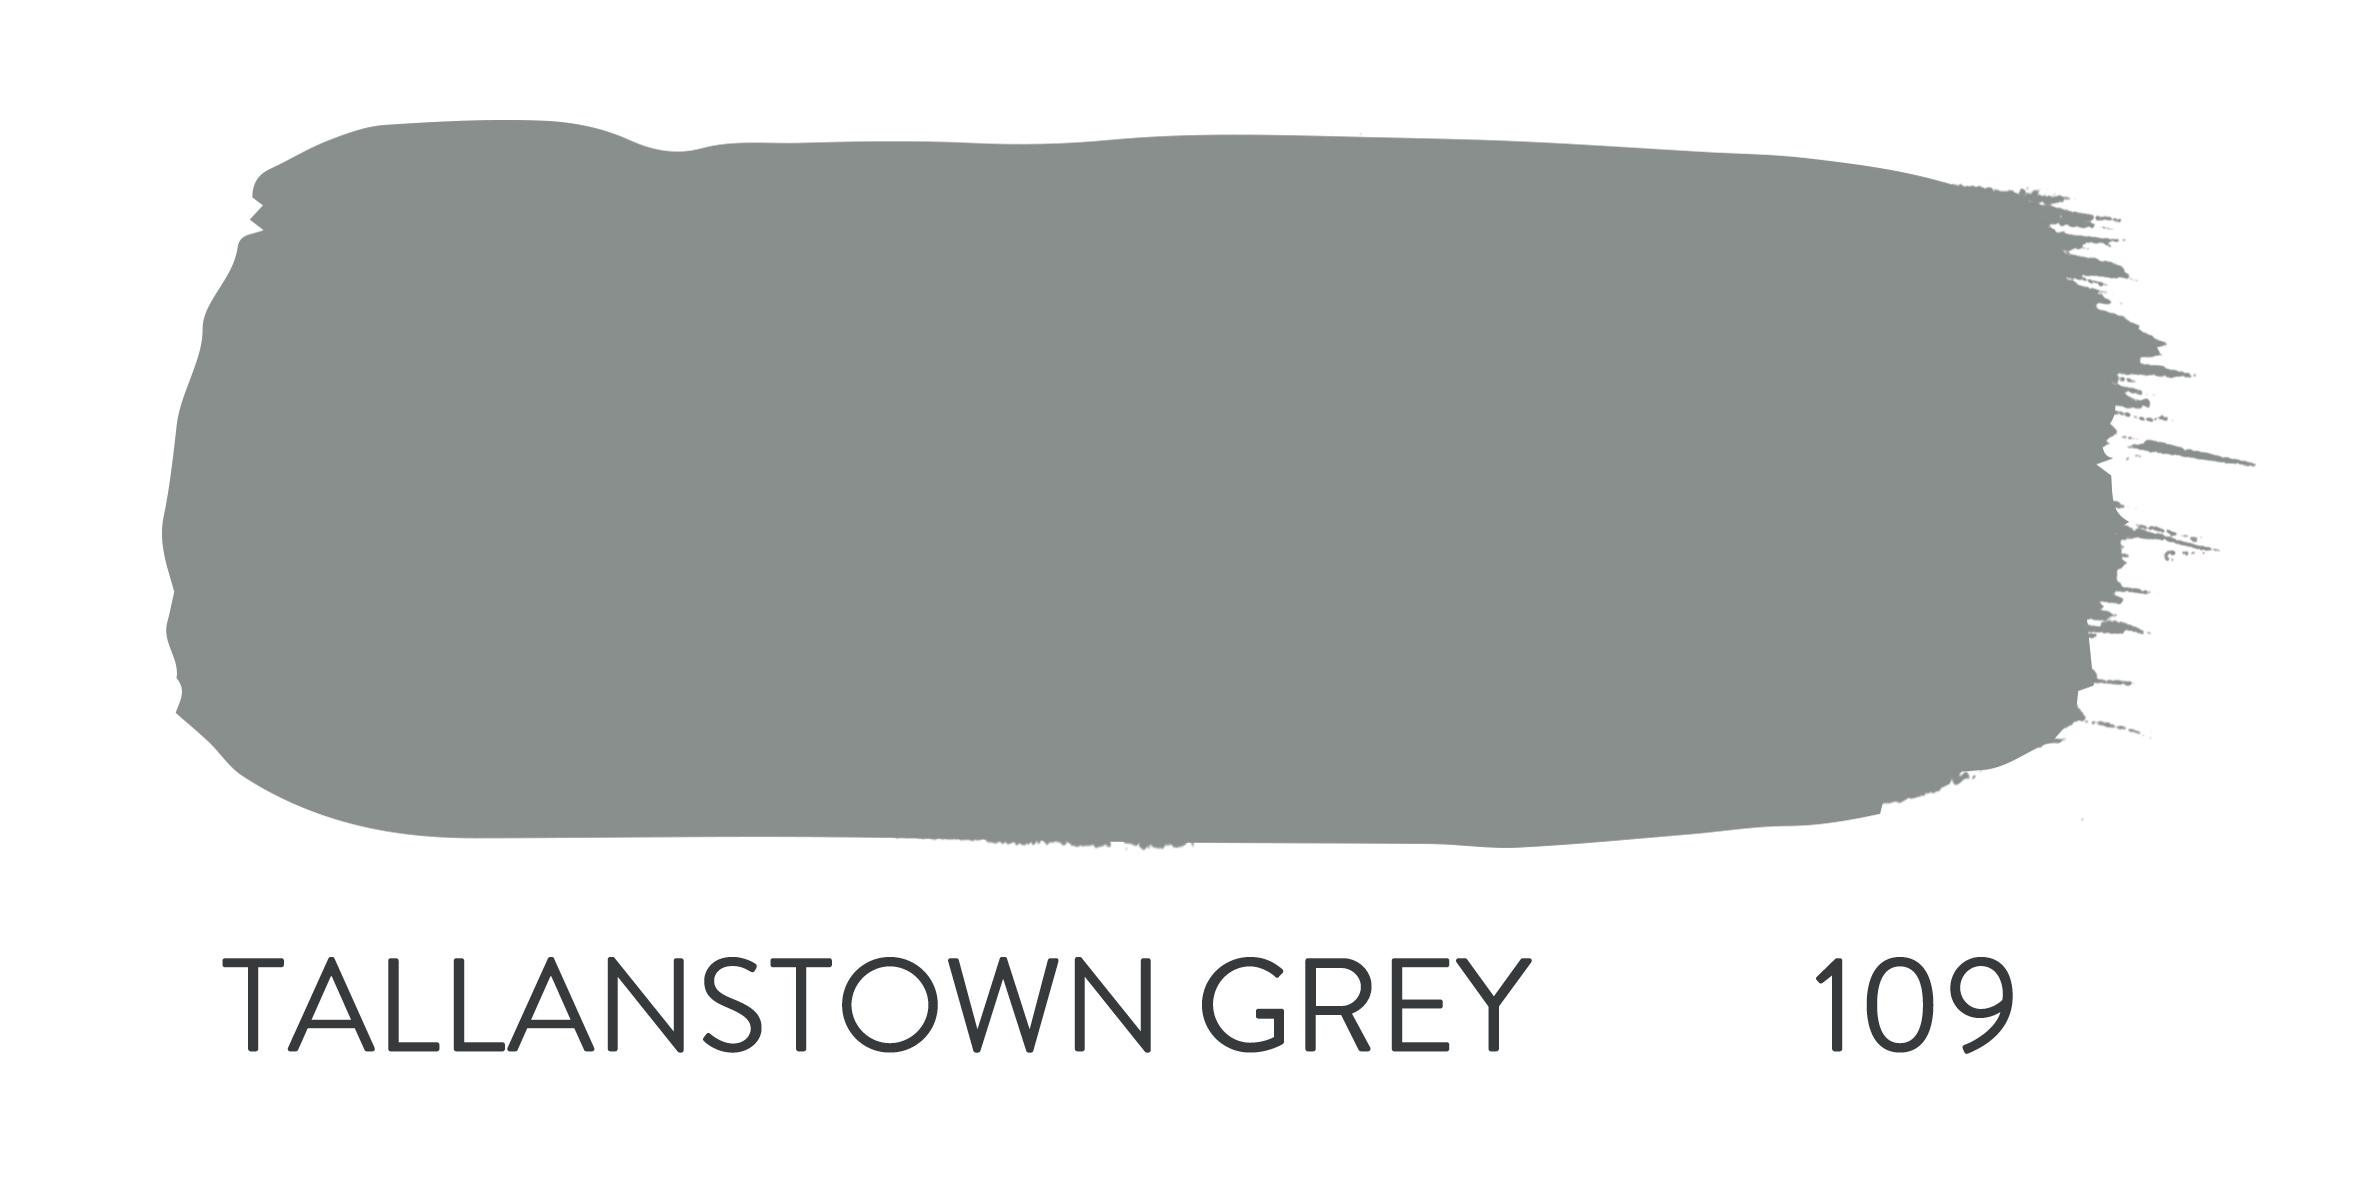 TALLANSTOWN GREY 109.jpg